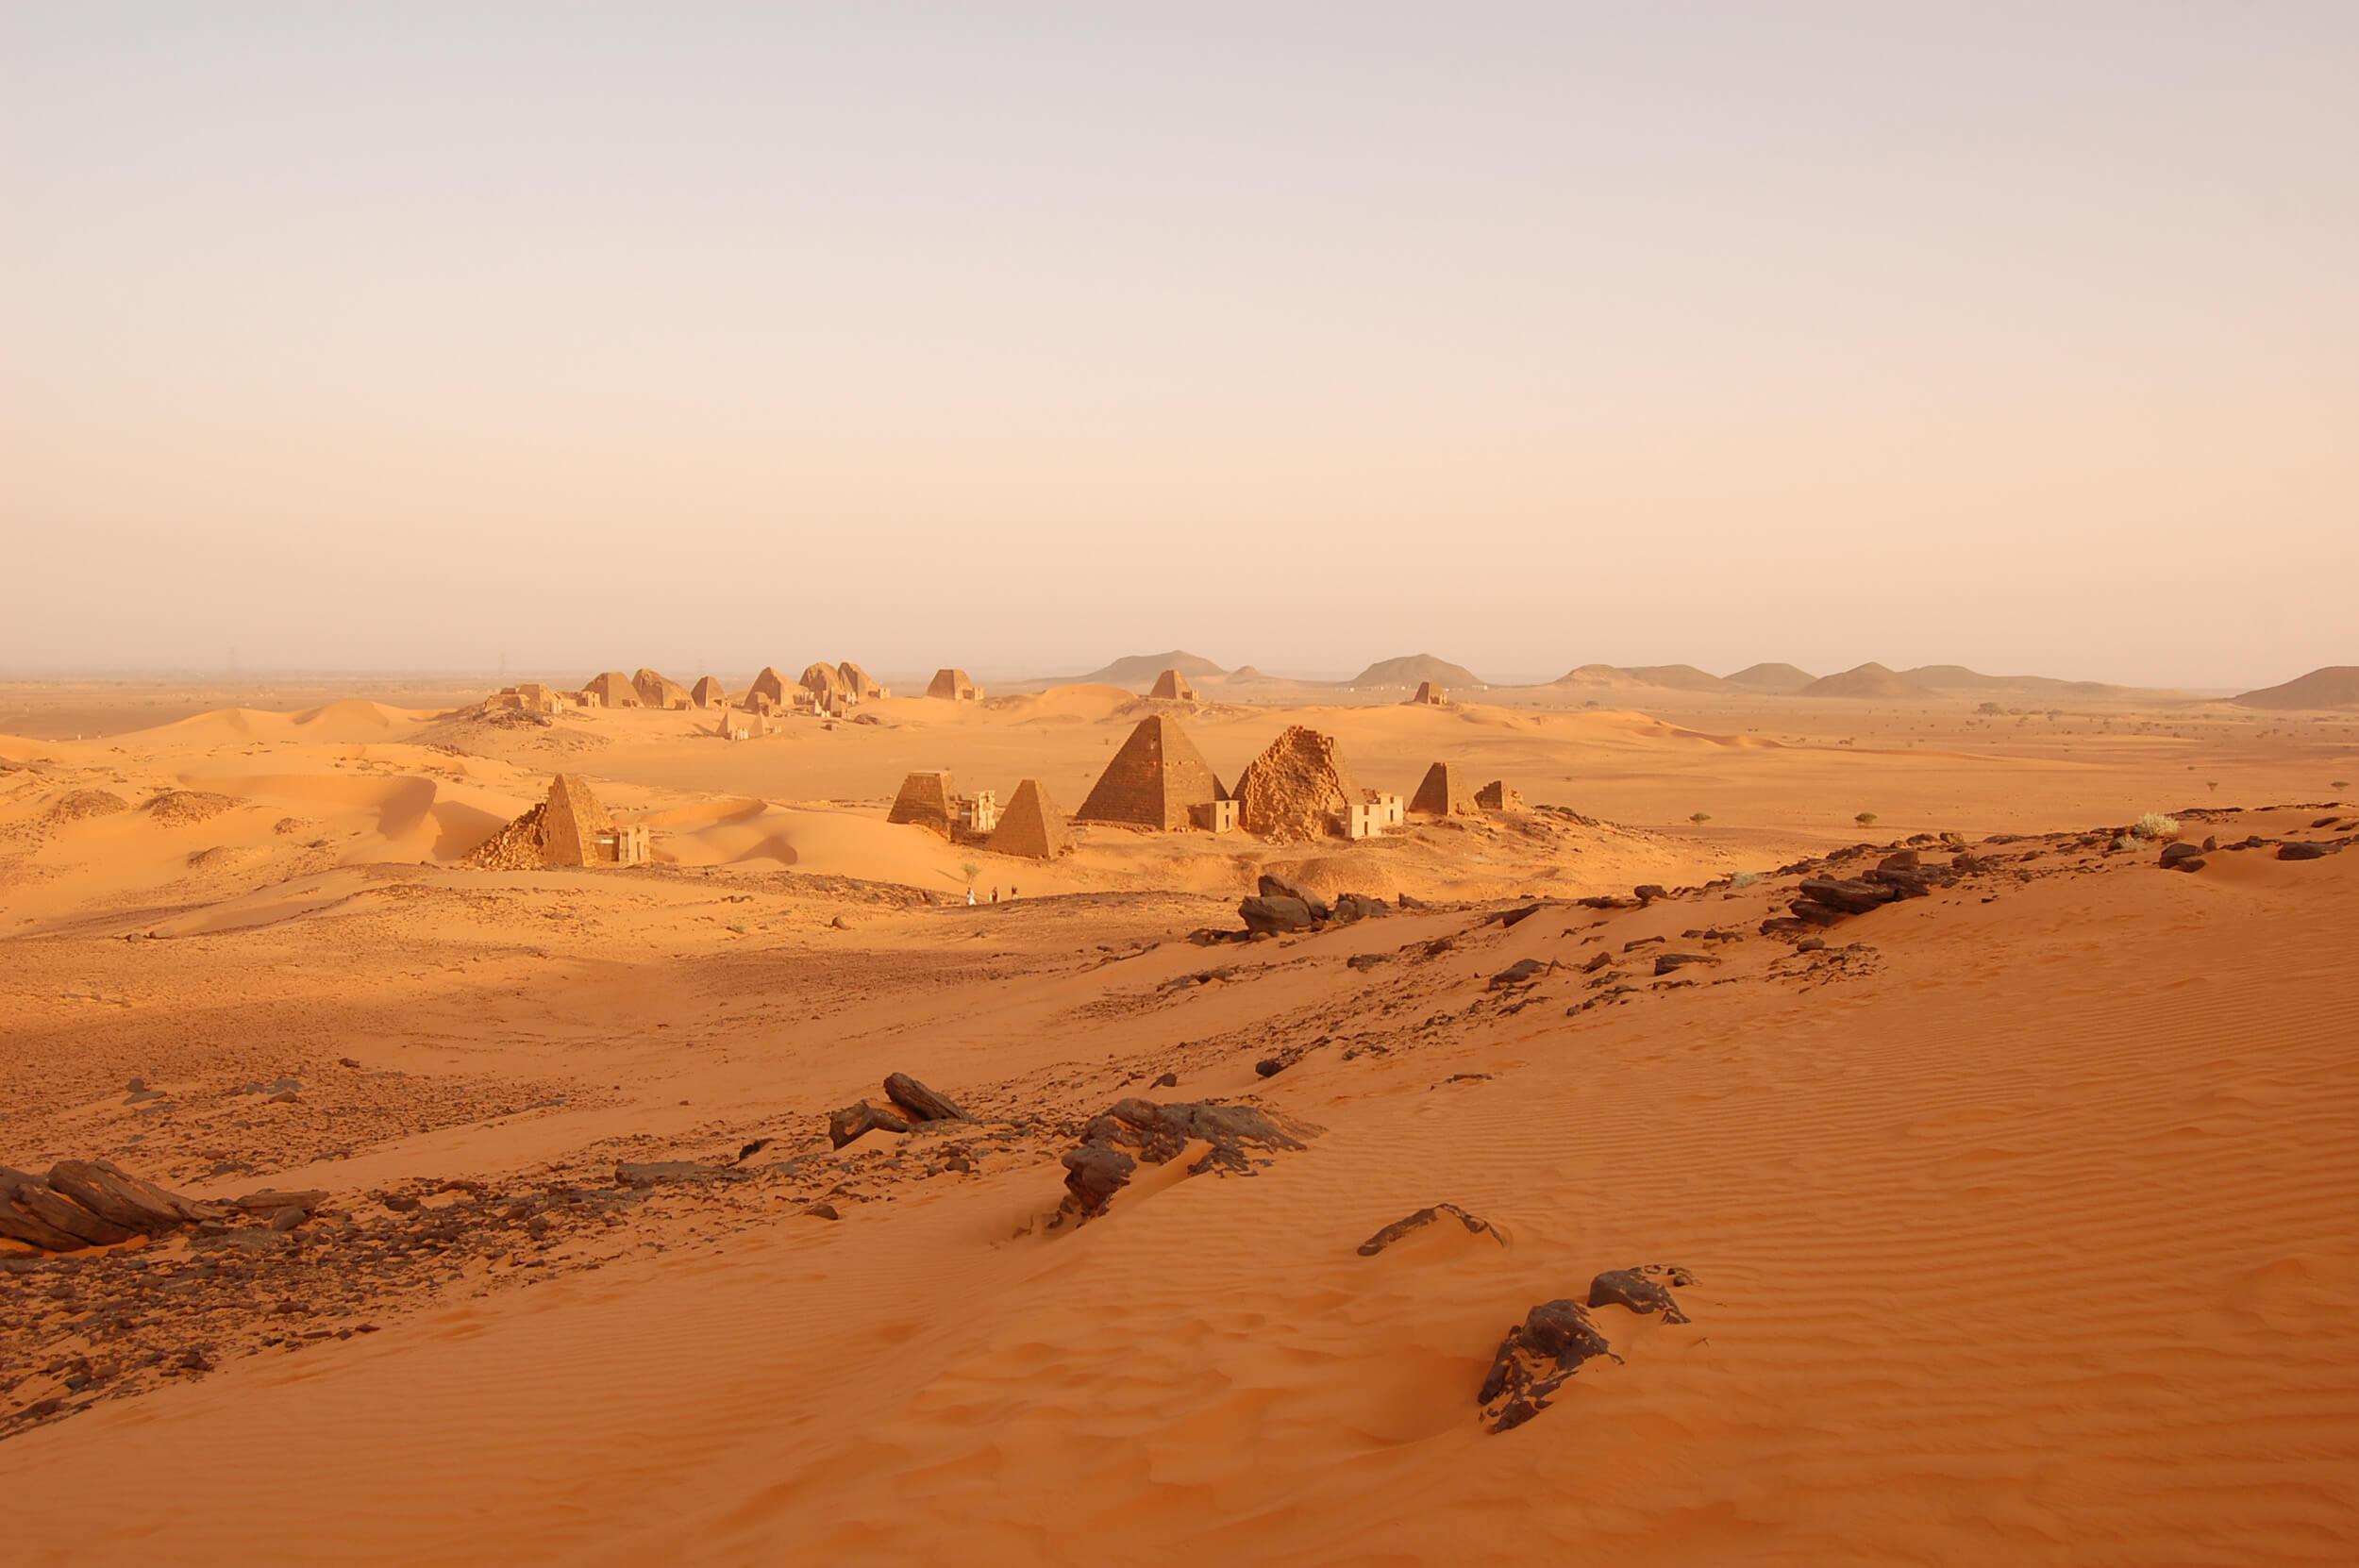 https://bubo.sk/uploads/galleries/7407/lubosfellner_sudan_viac-pyramid-nez-v-egypte-meroe.jpg